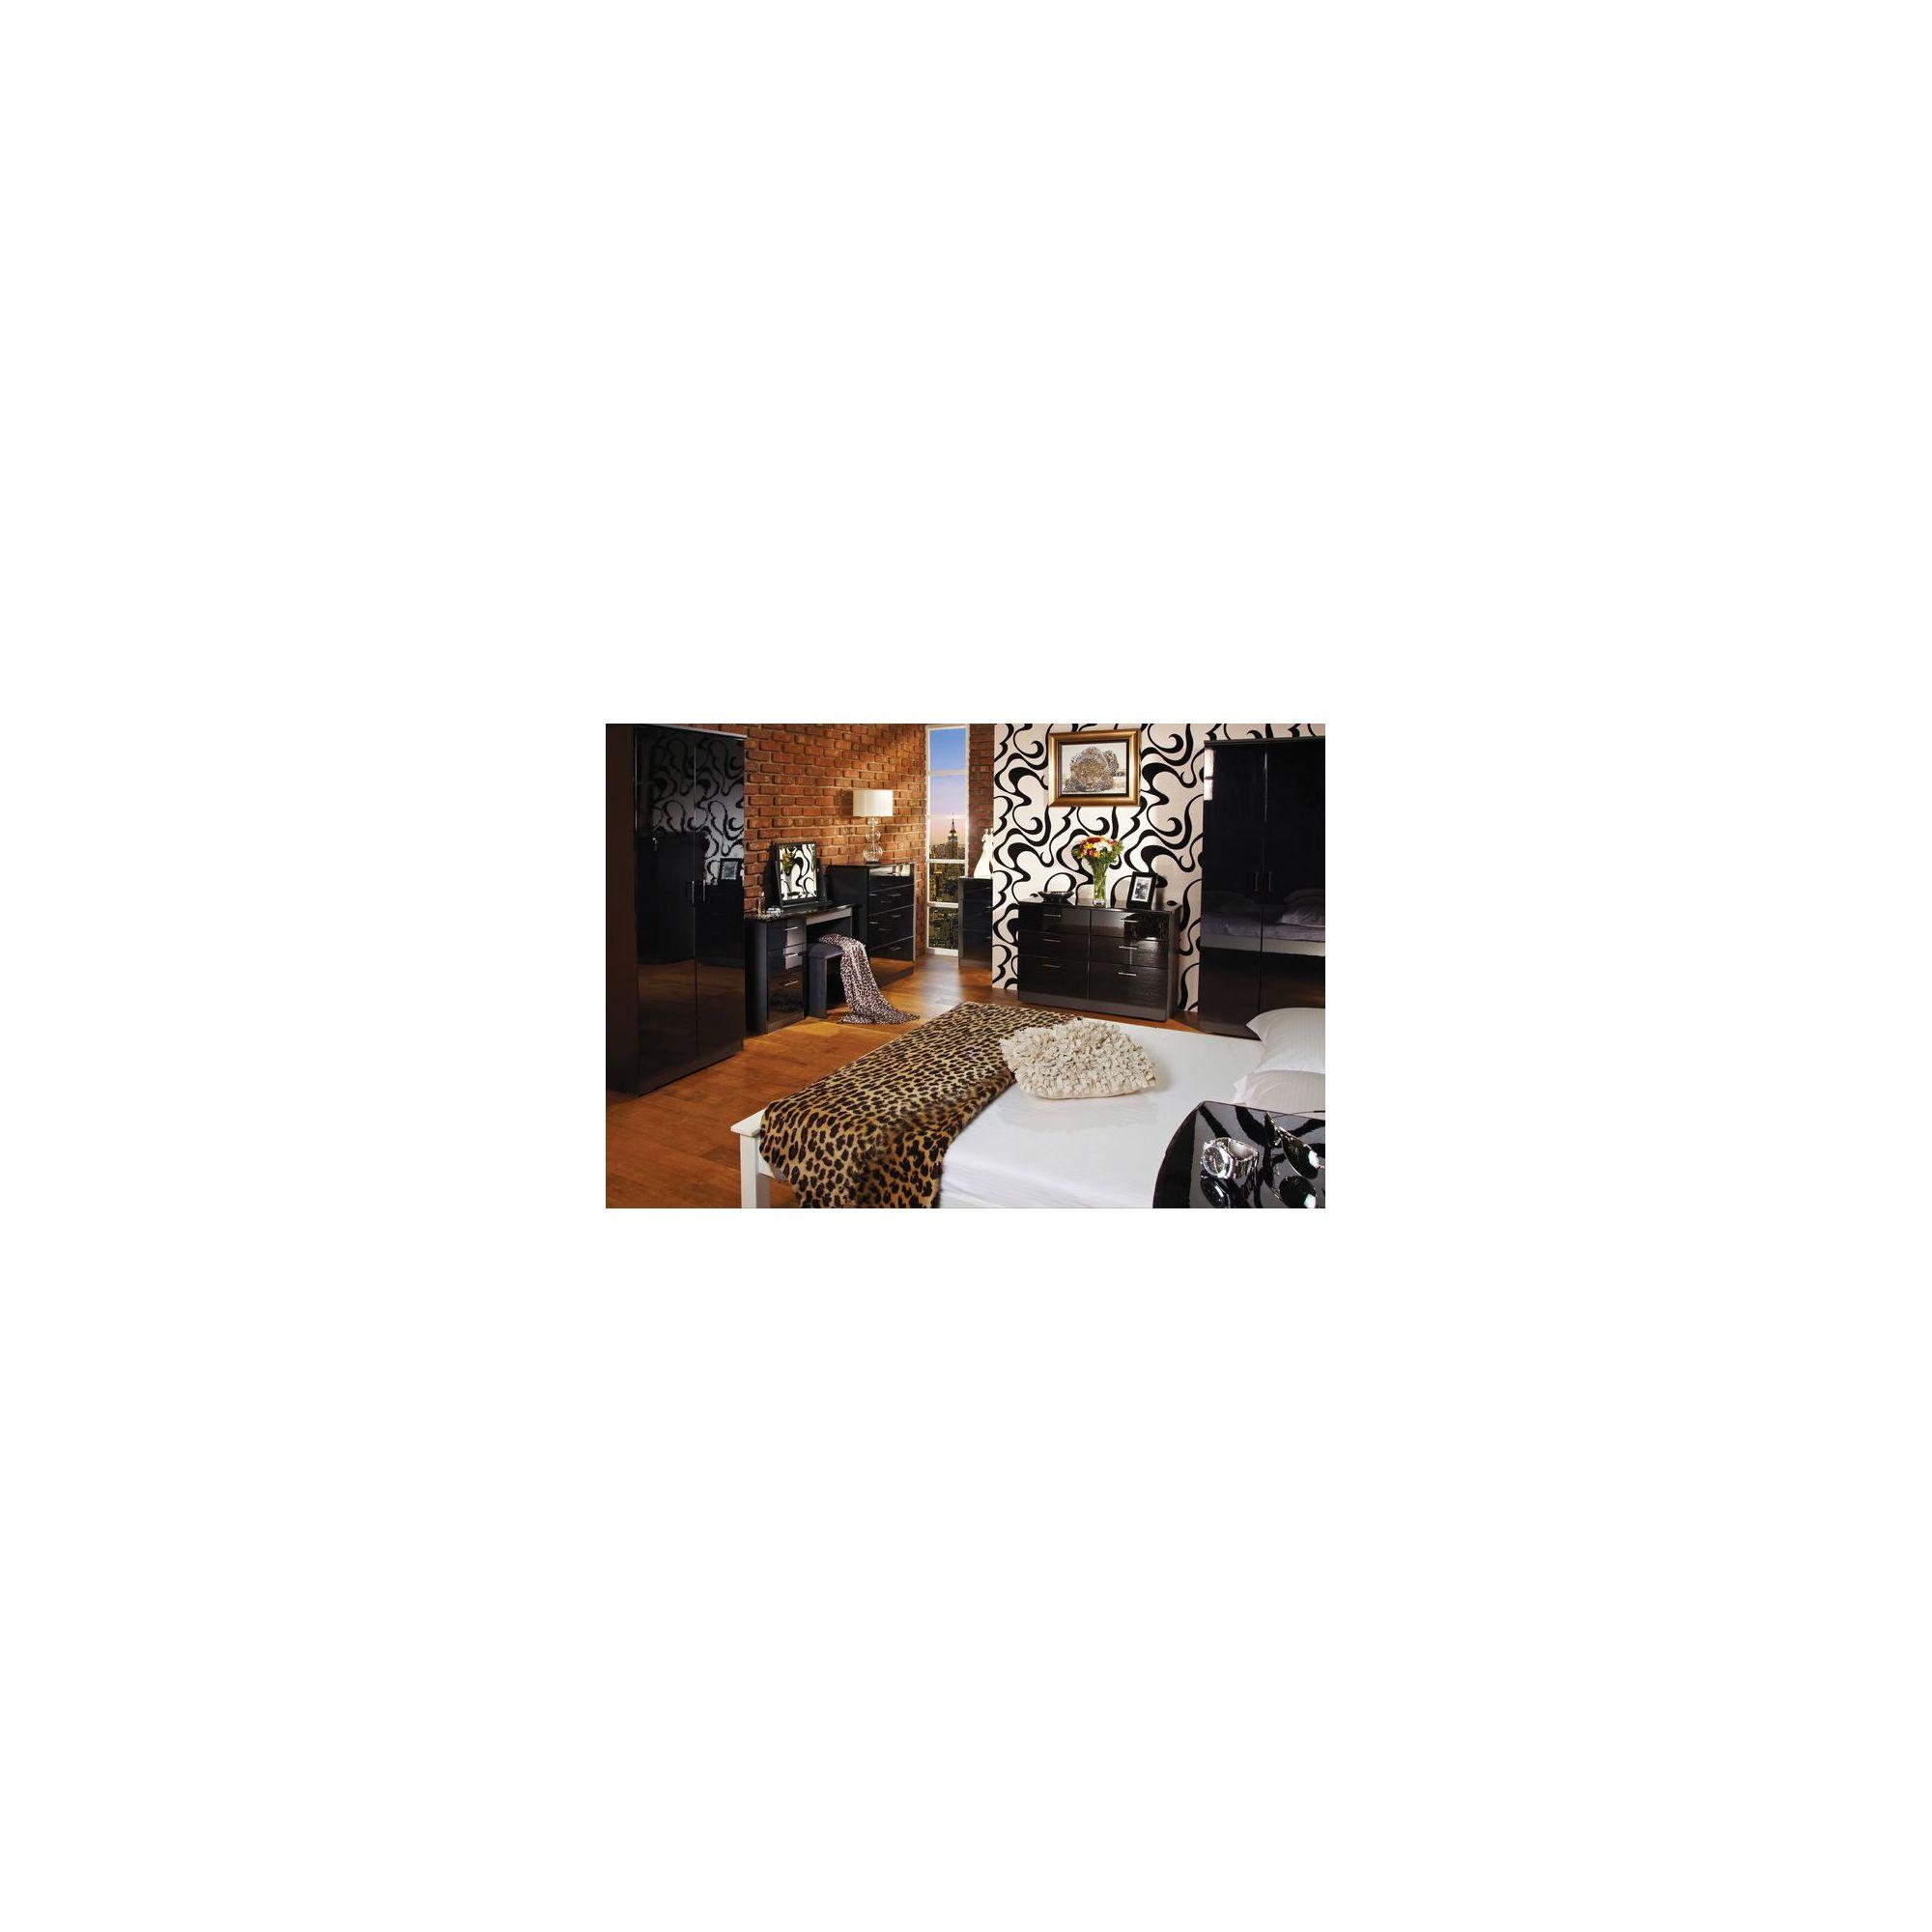 Welcome Furniture Mayfair Tall Plain Wardrobe - Aubergine - Black - Black at Tesco Direct